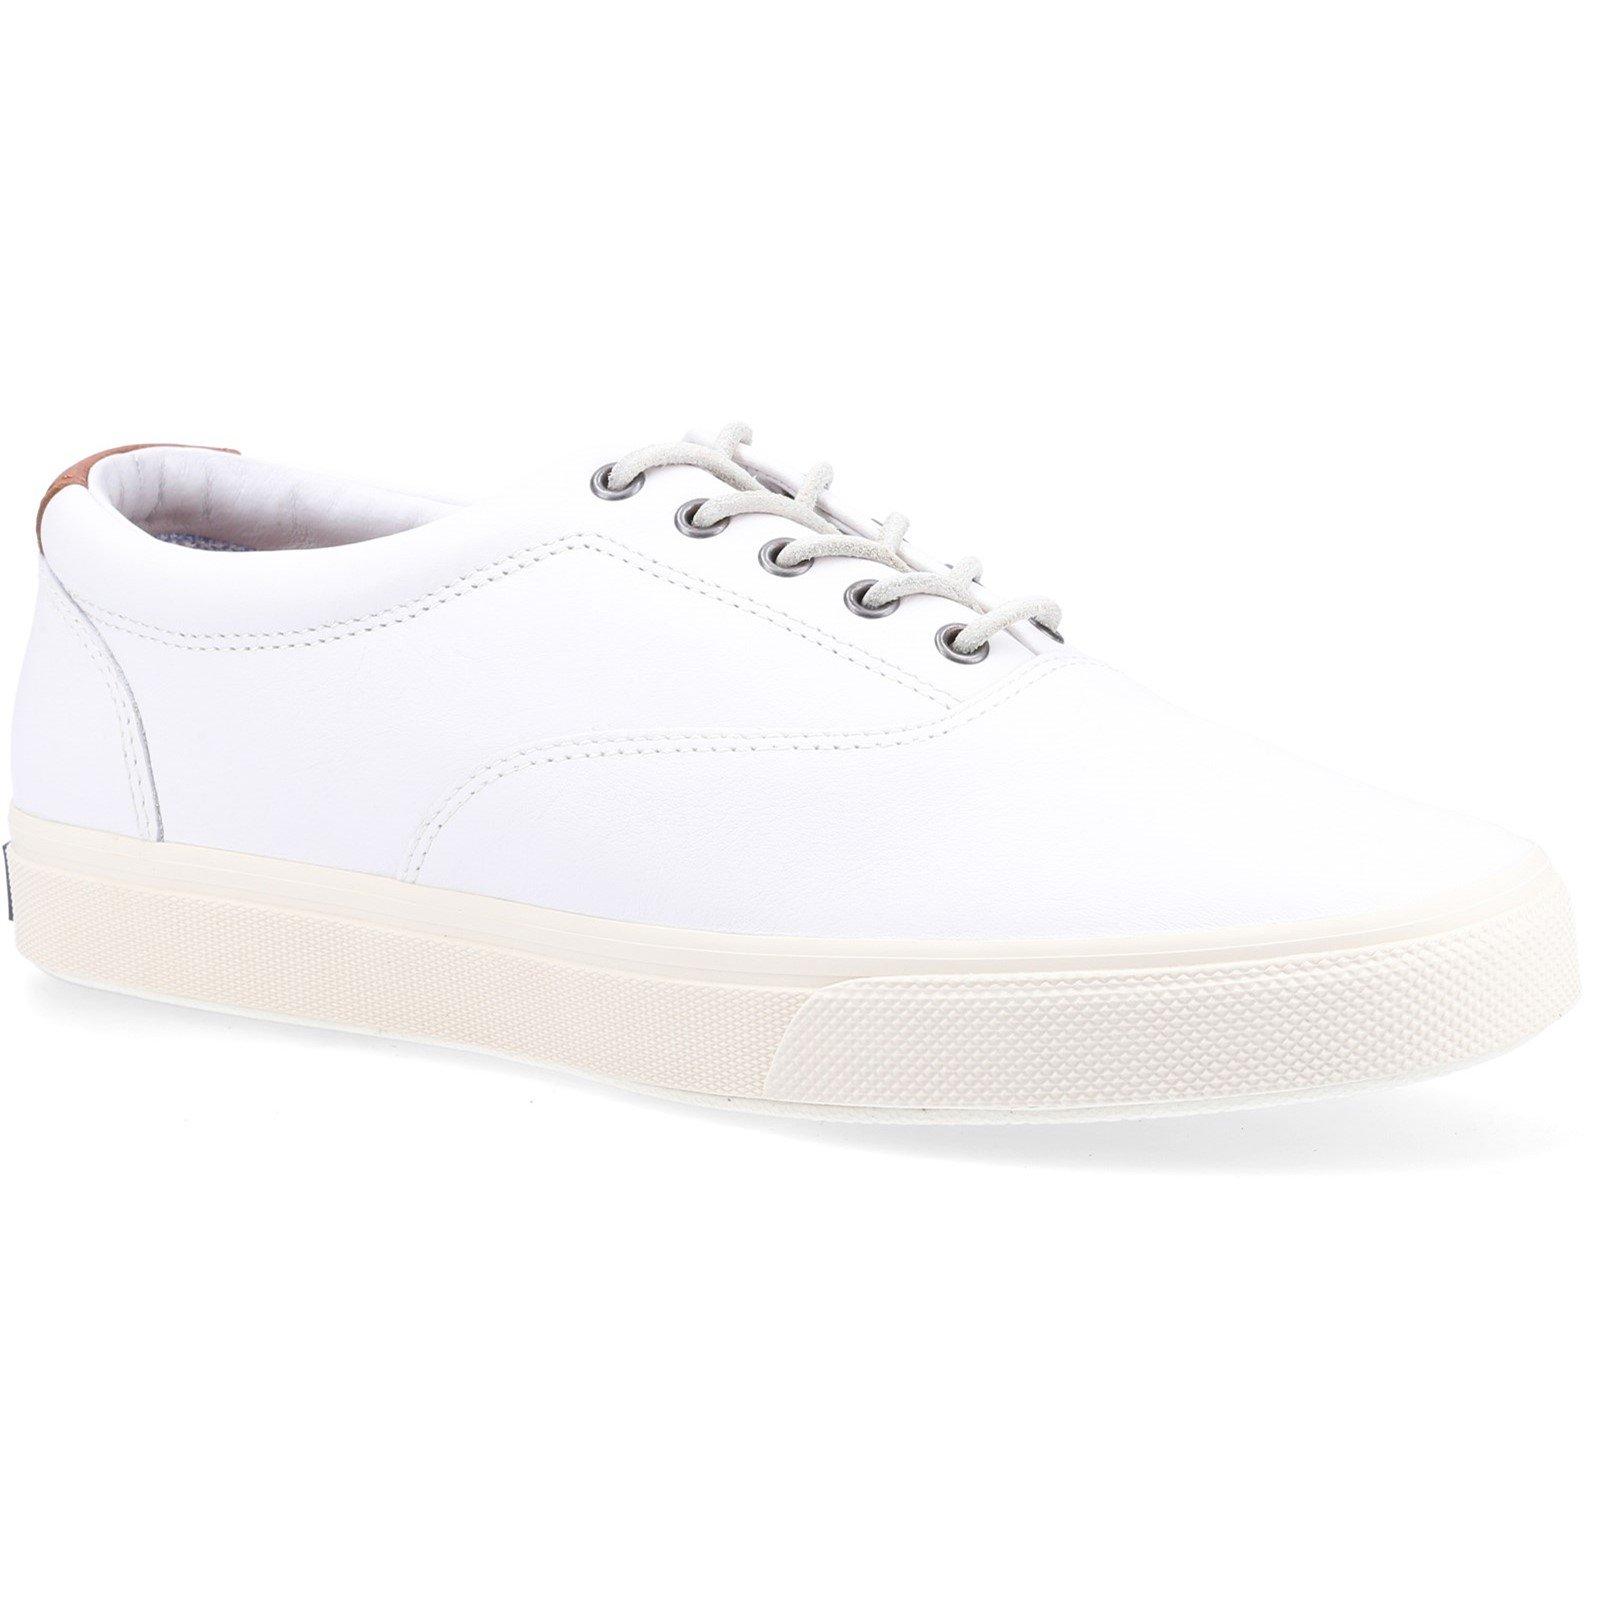 Sperry Men's Striper Plushwave CVO Trainer White 32401 - White 7